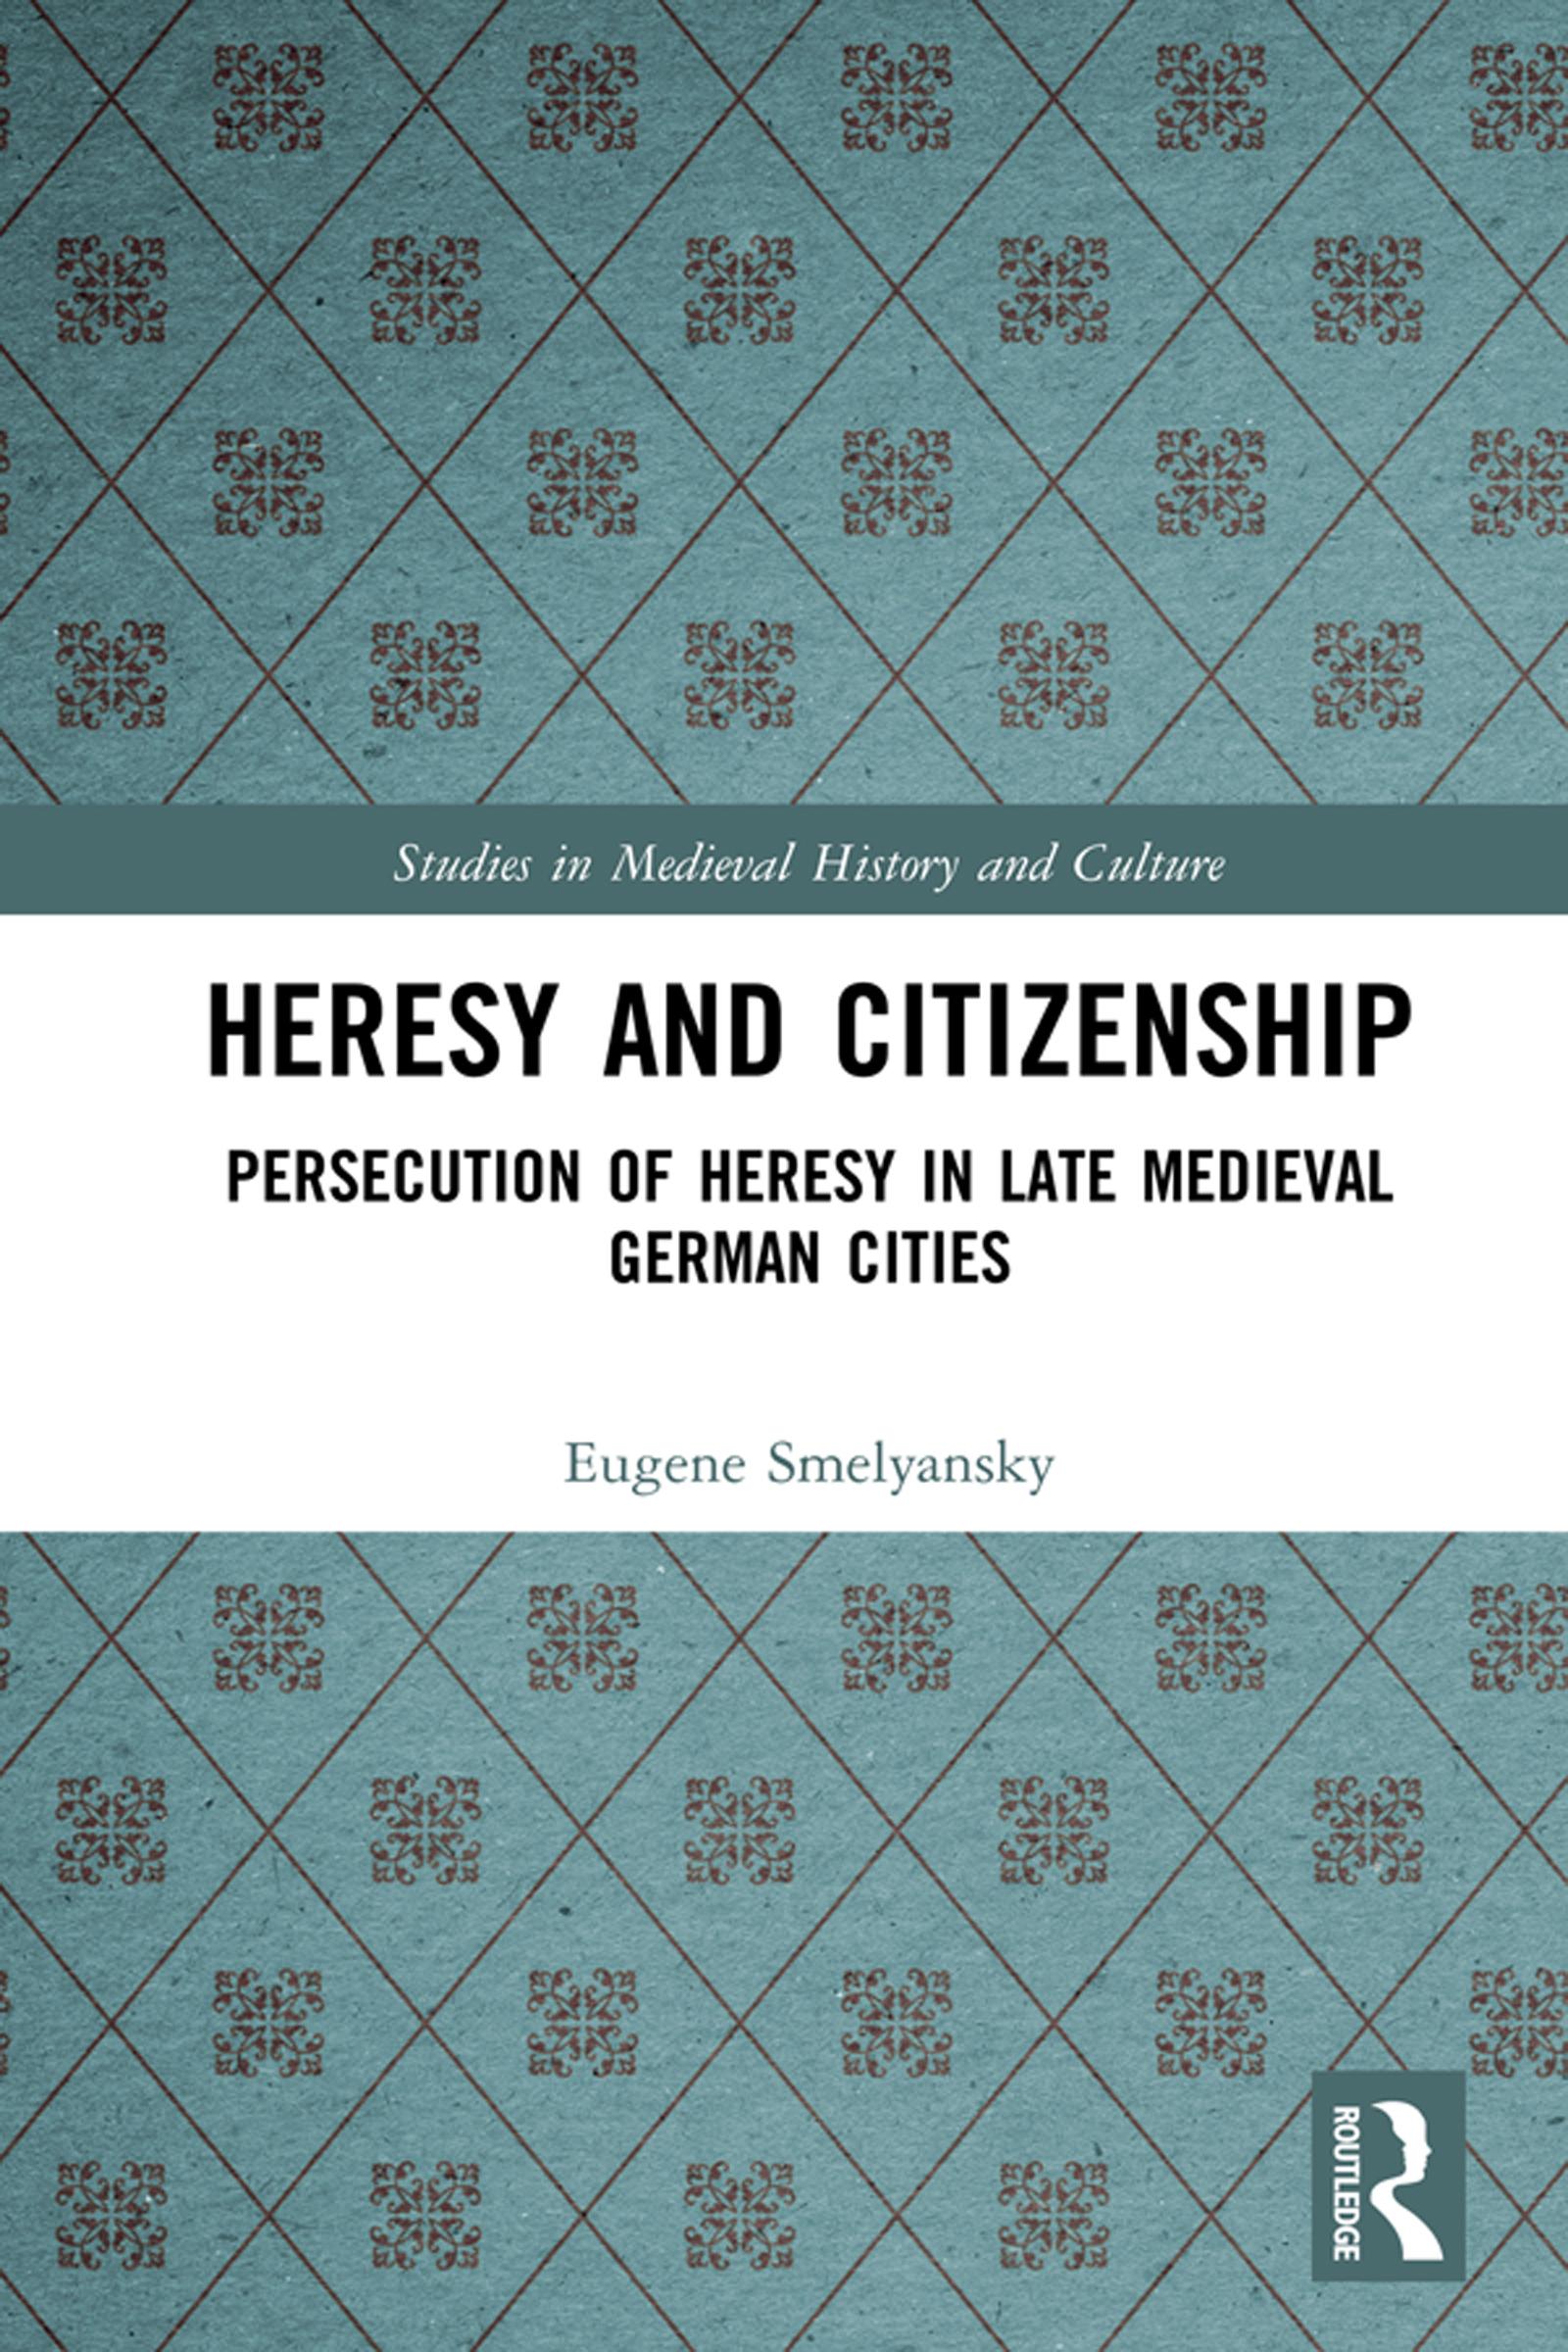 Heresy and Citizenship